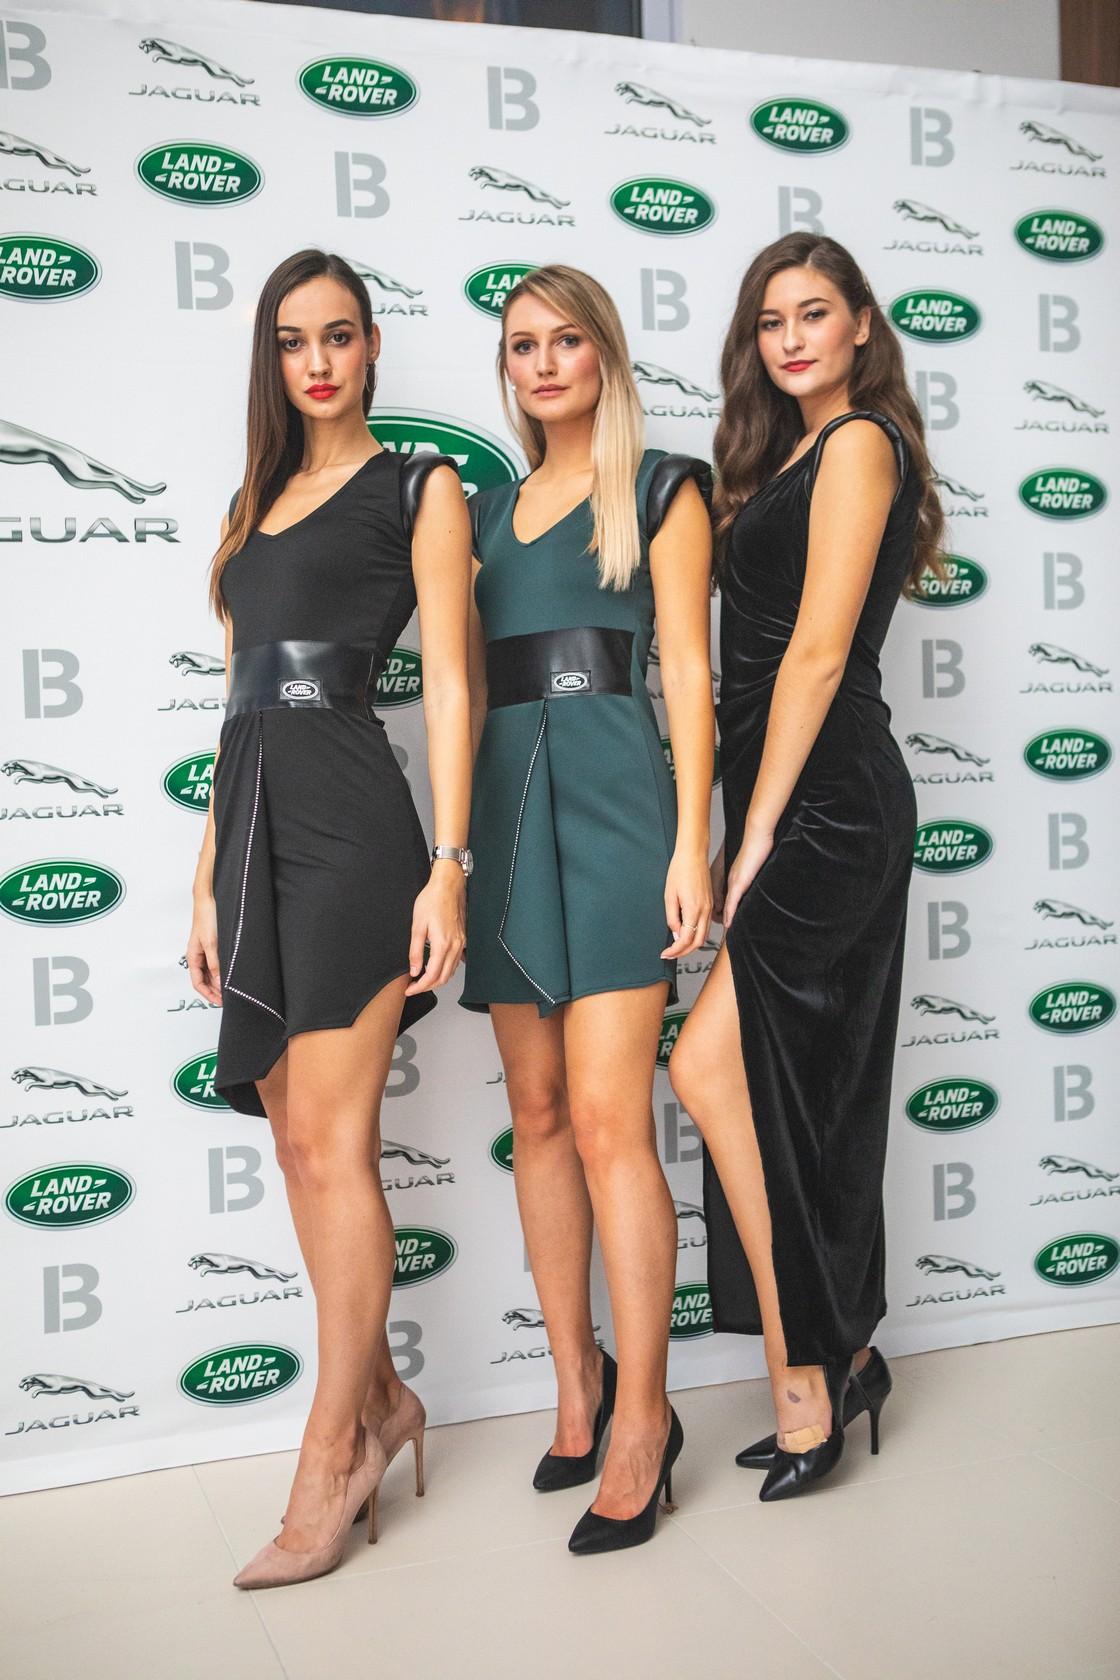 Boris Banovic Workwear